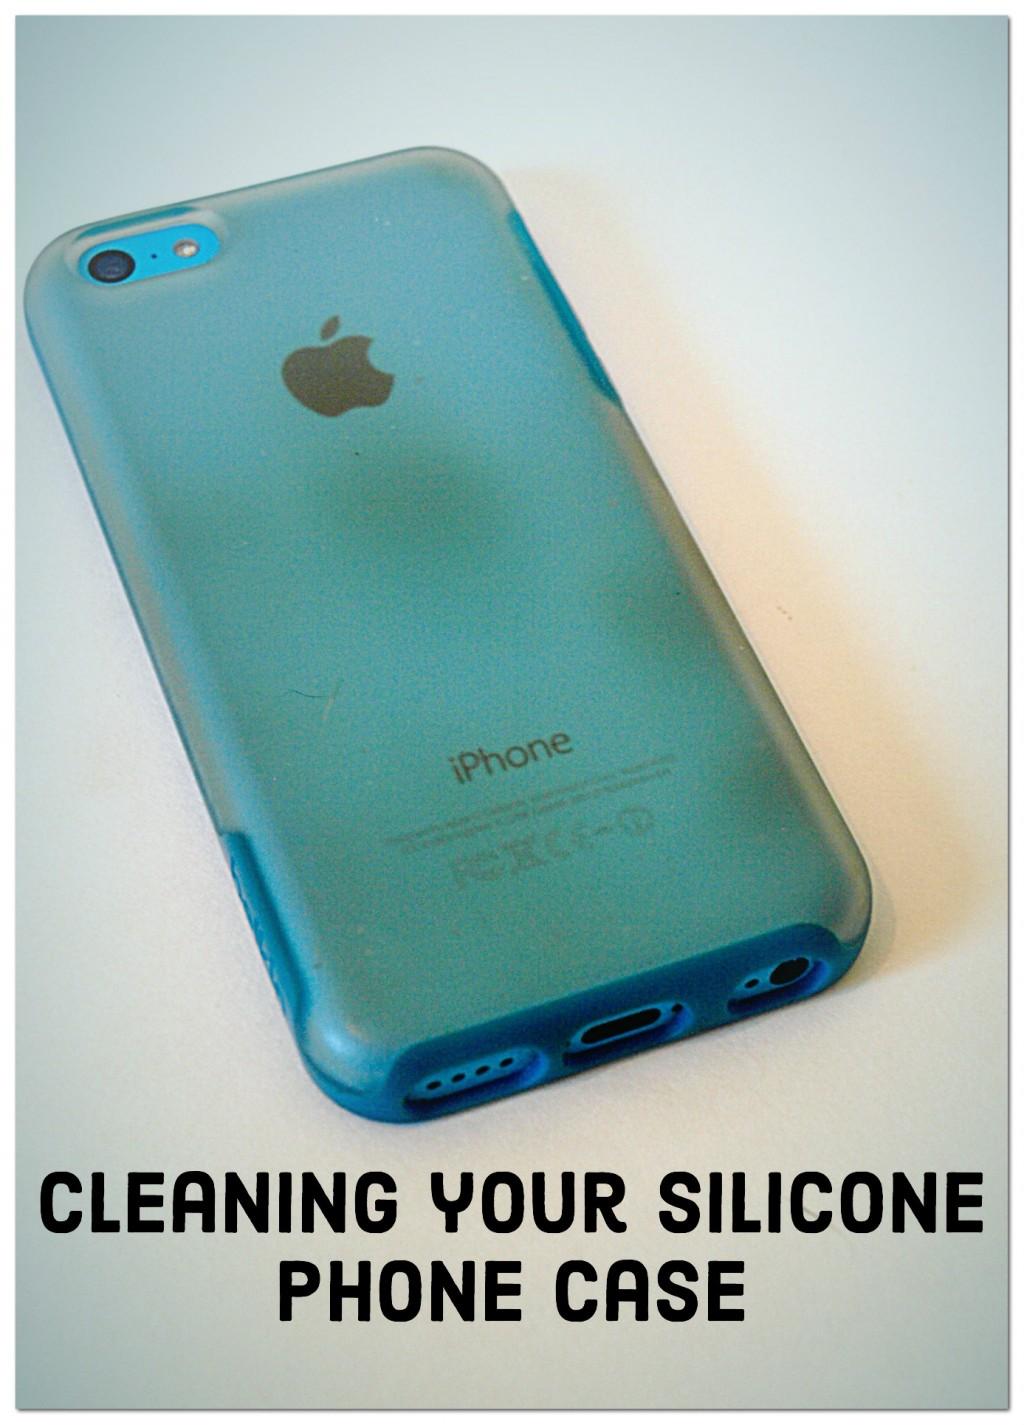 How do I clean my phone